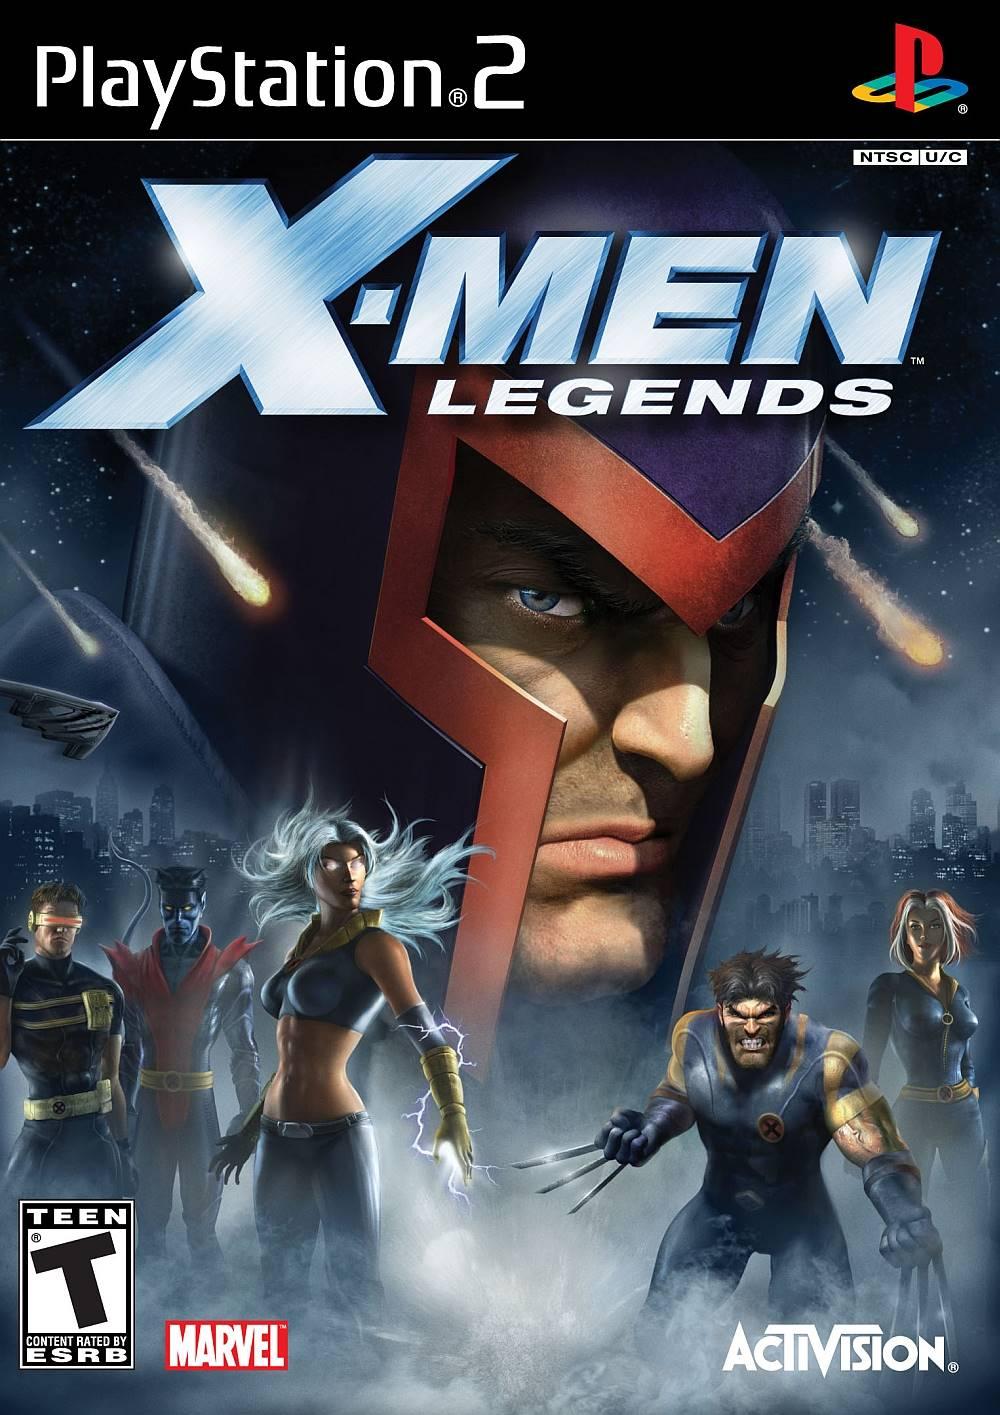 X Men Legends In 2020 Playstation Sony Playstation X Men